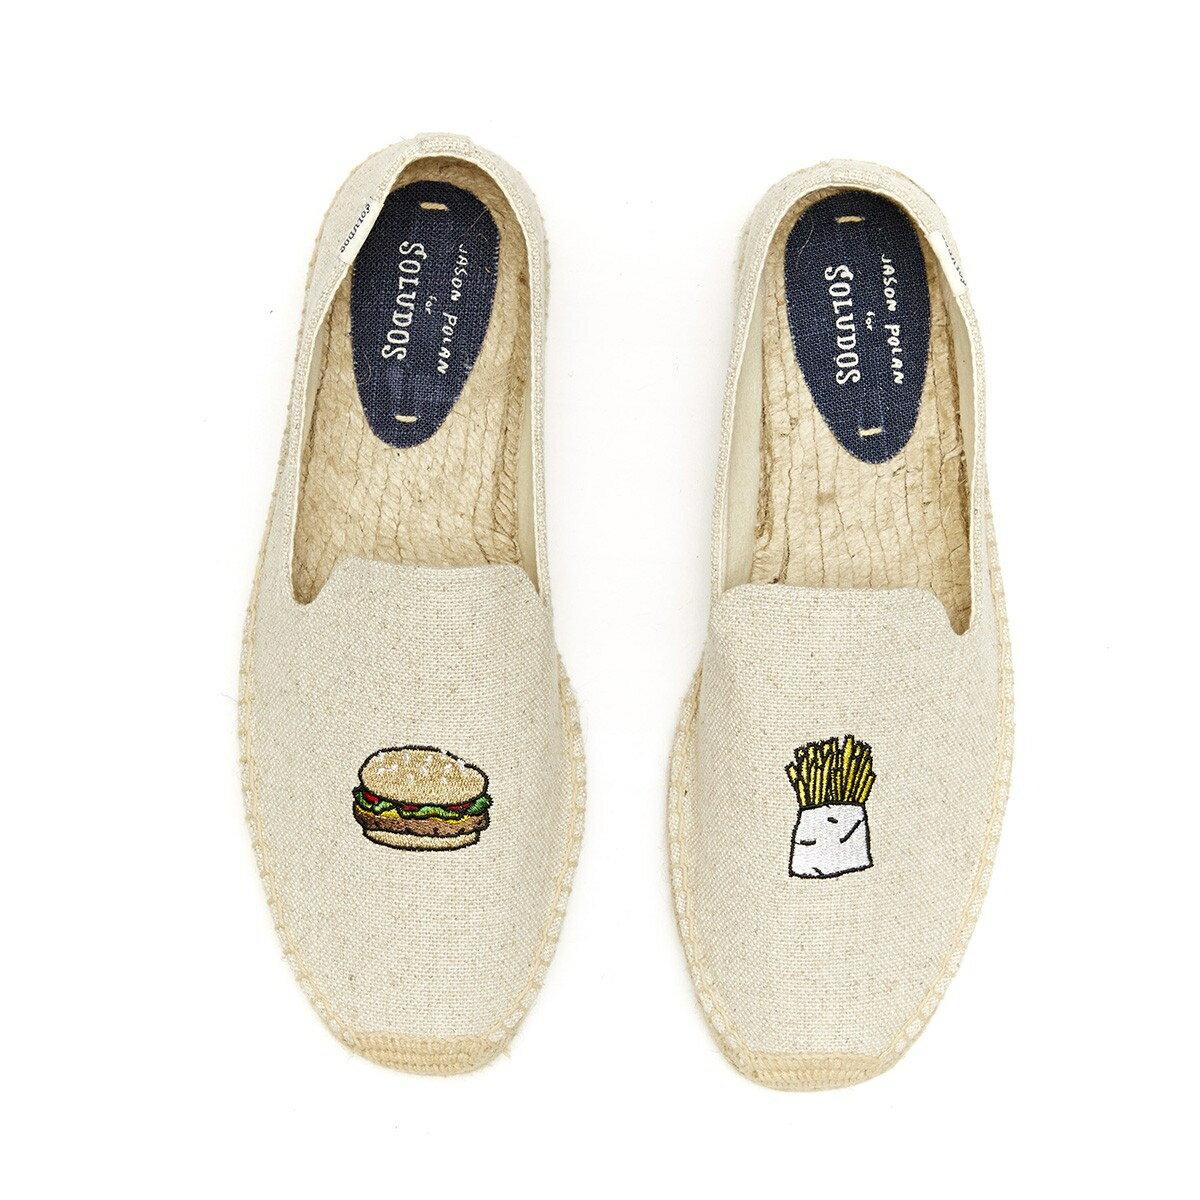 【Soludos】美國經典草編鞋-塗鴉系列草編鞋-漢堡薯條/米色 1